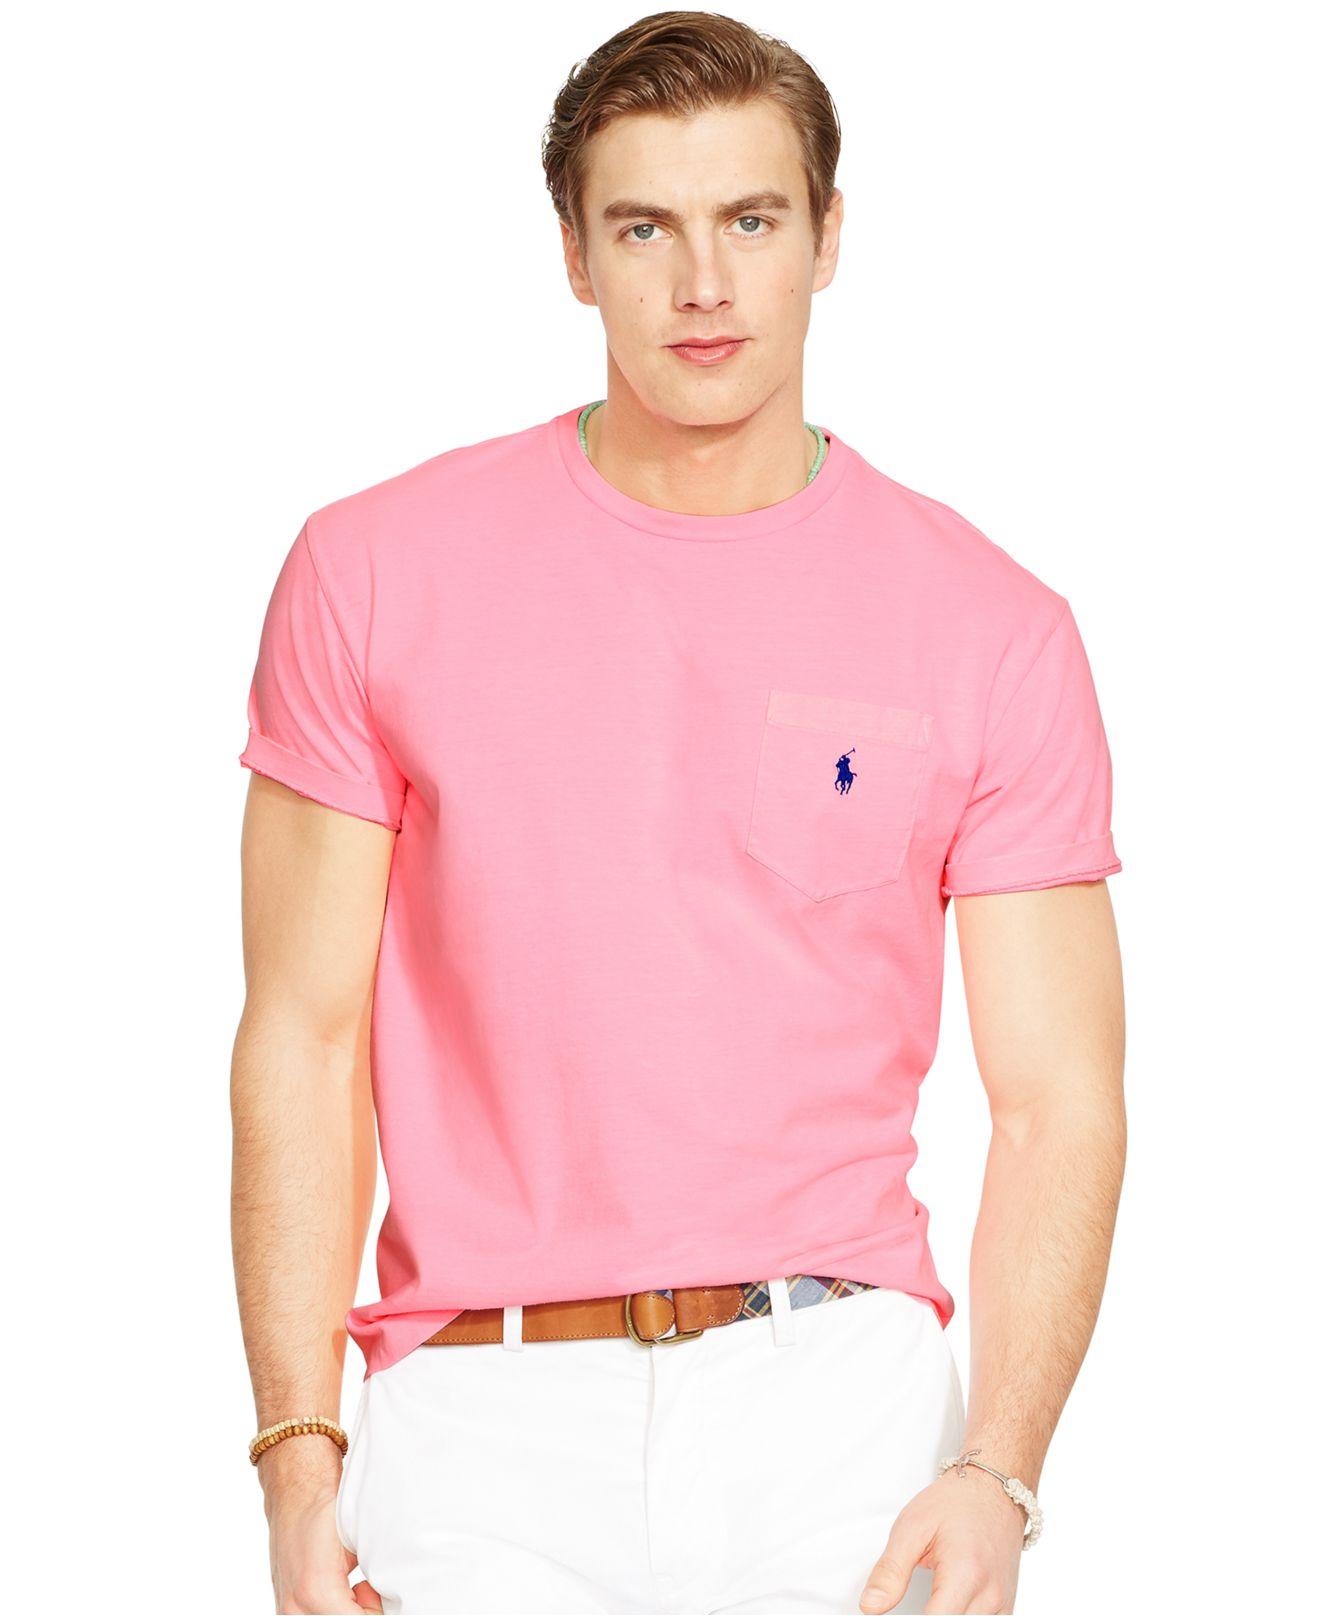 2438dceec673 Lyst - Polo Ralph Lauren Classic-fit Neon Jersey Pocket Crew-neck T ...